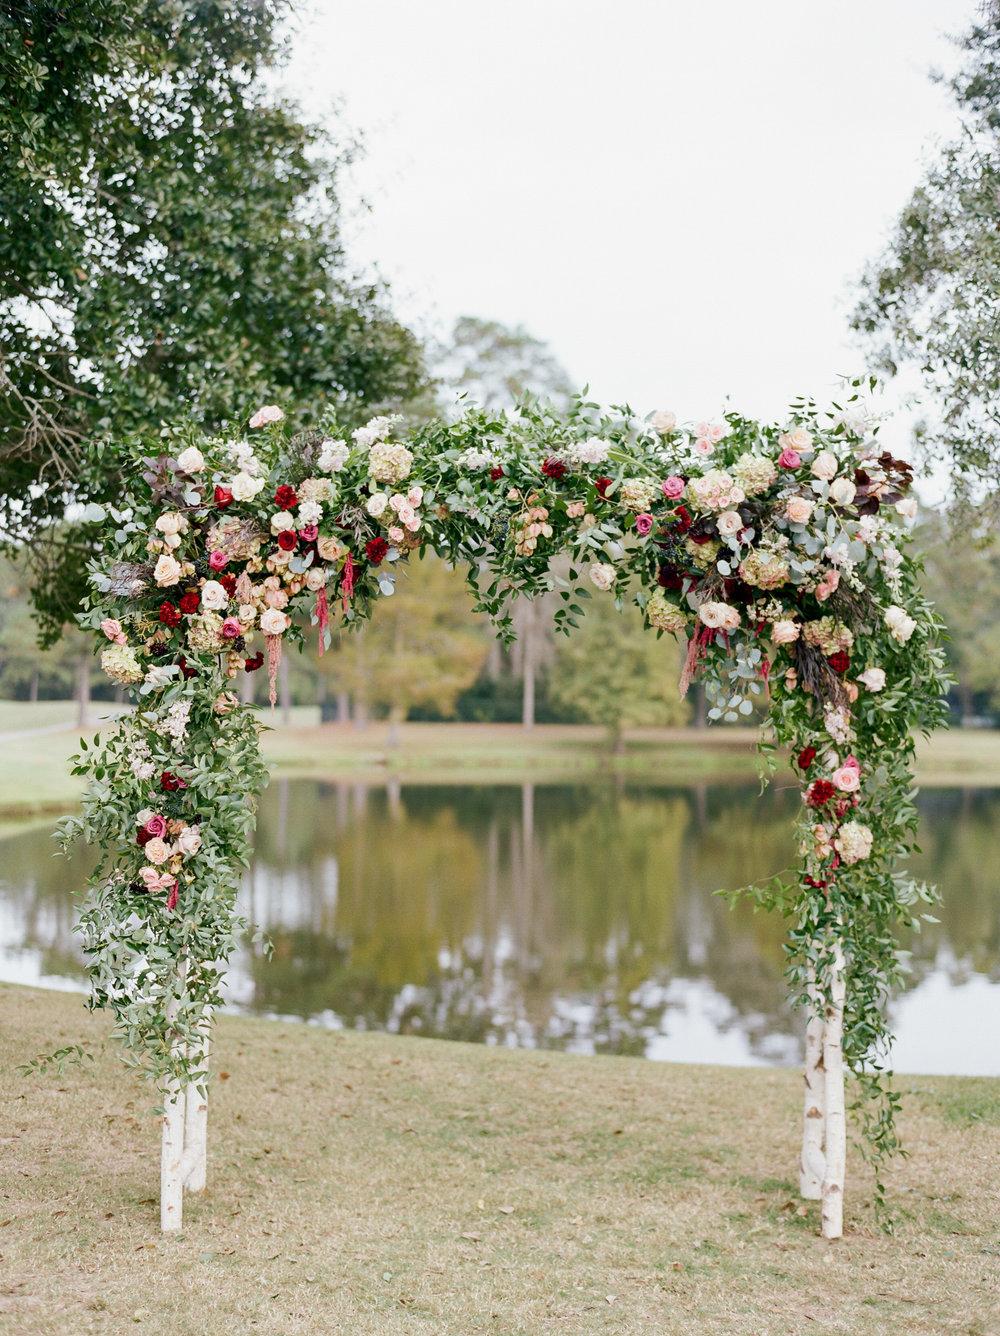 Houston-Wedding-Photographer-Fine-Art-Film-Destination-Style-Me-Pretty-Austin-Dallas-New-Orleans-Dana-Fernandez-Photography-The Woodlands-Country-Club-14.jpg